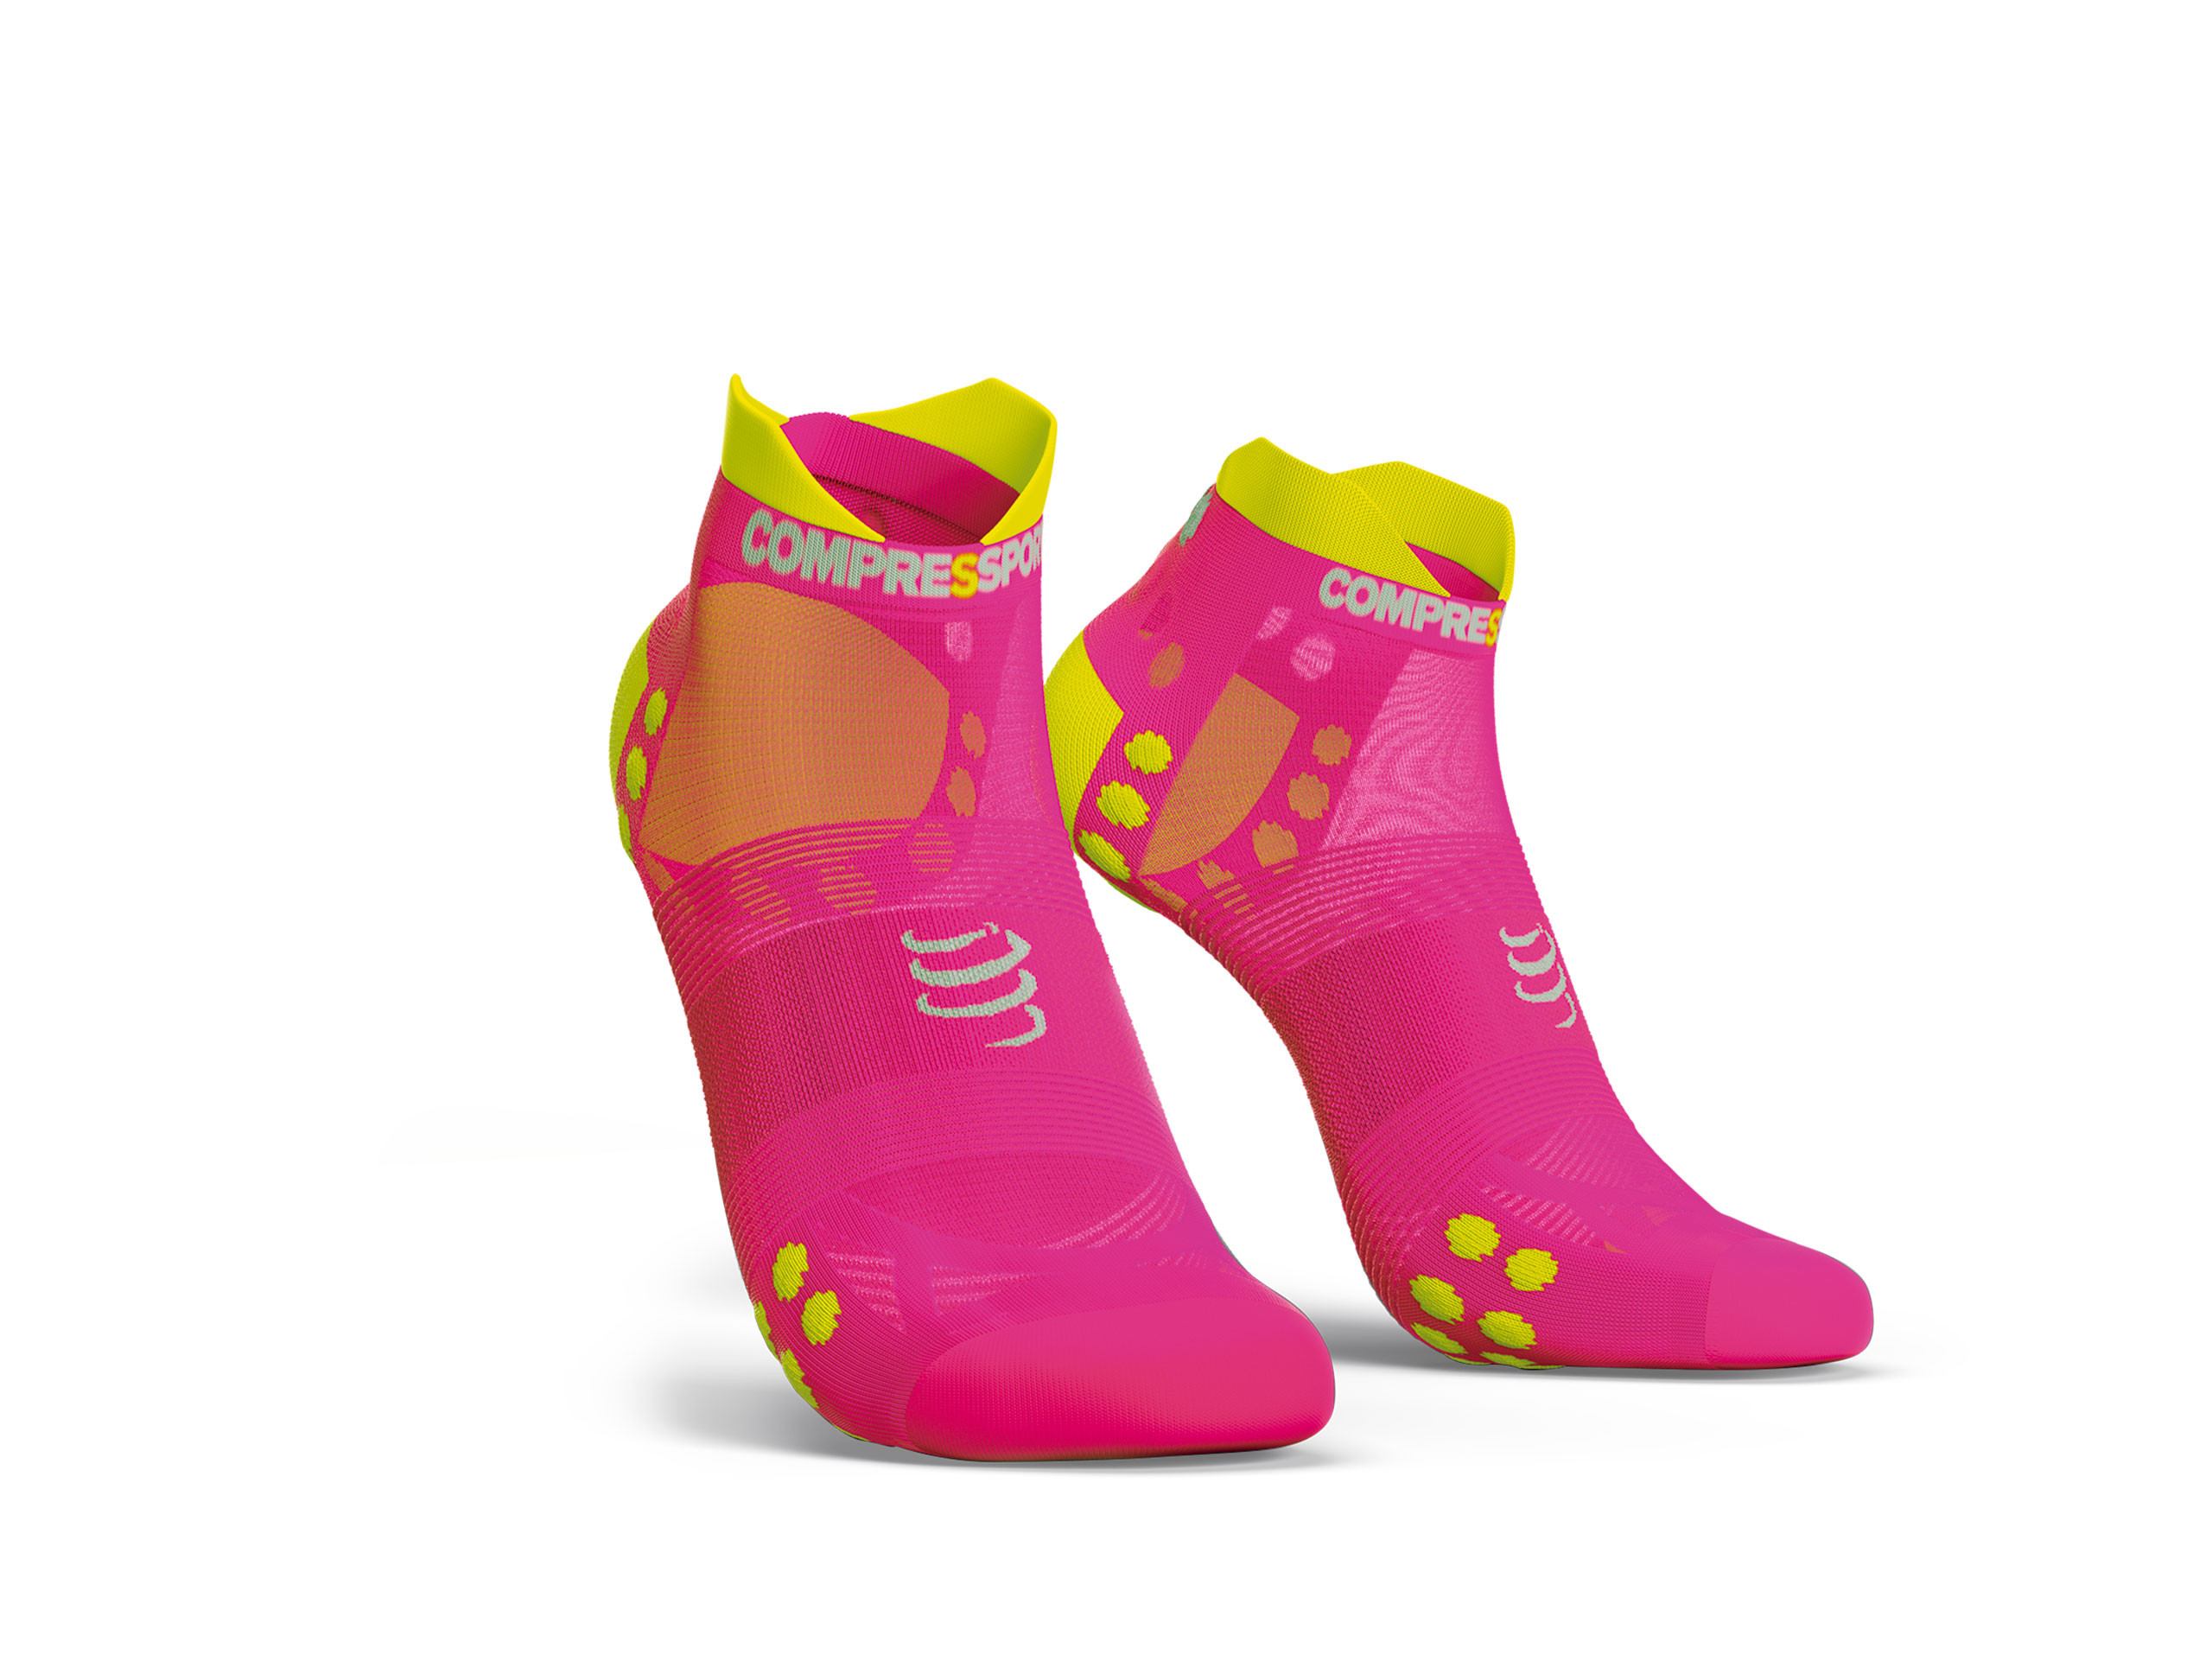 Pro Racing Socks v3.0 Run Ultralight Run Low neonpink